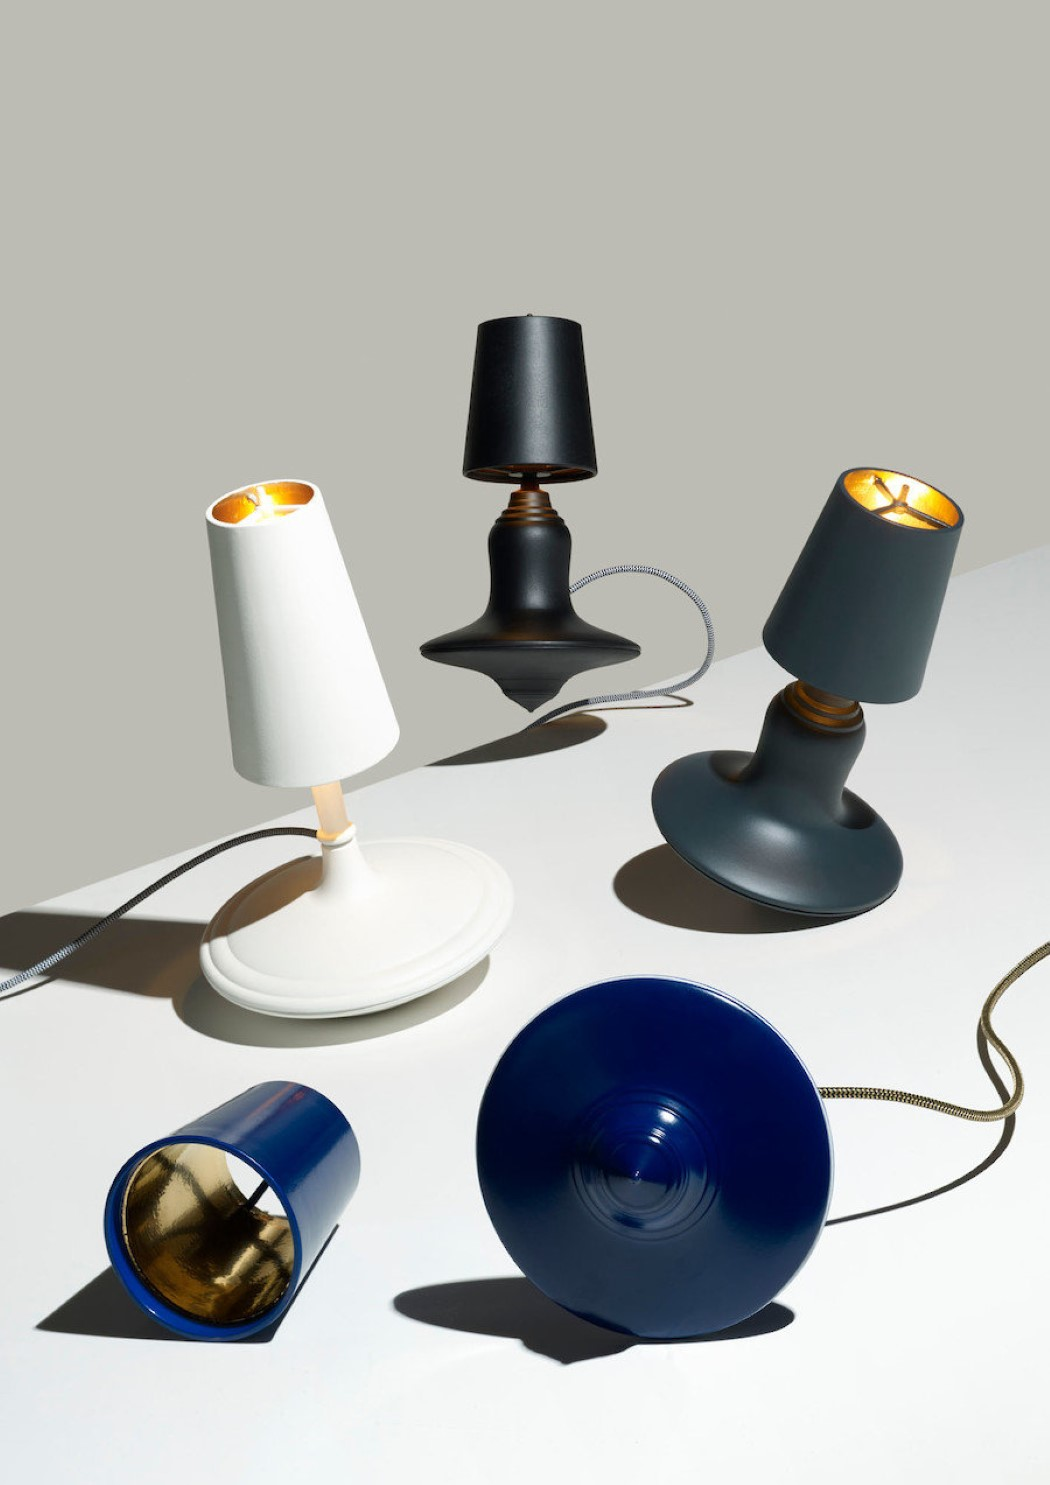 spintop_lamp_3